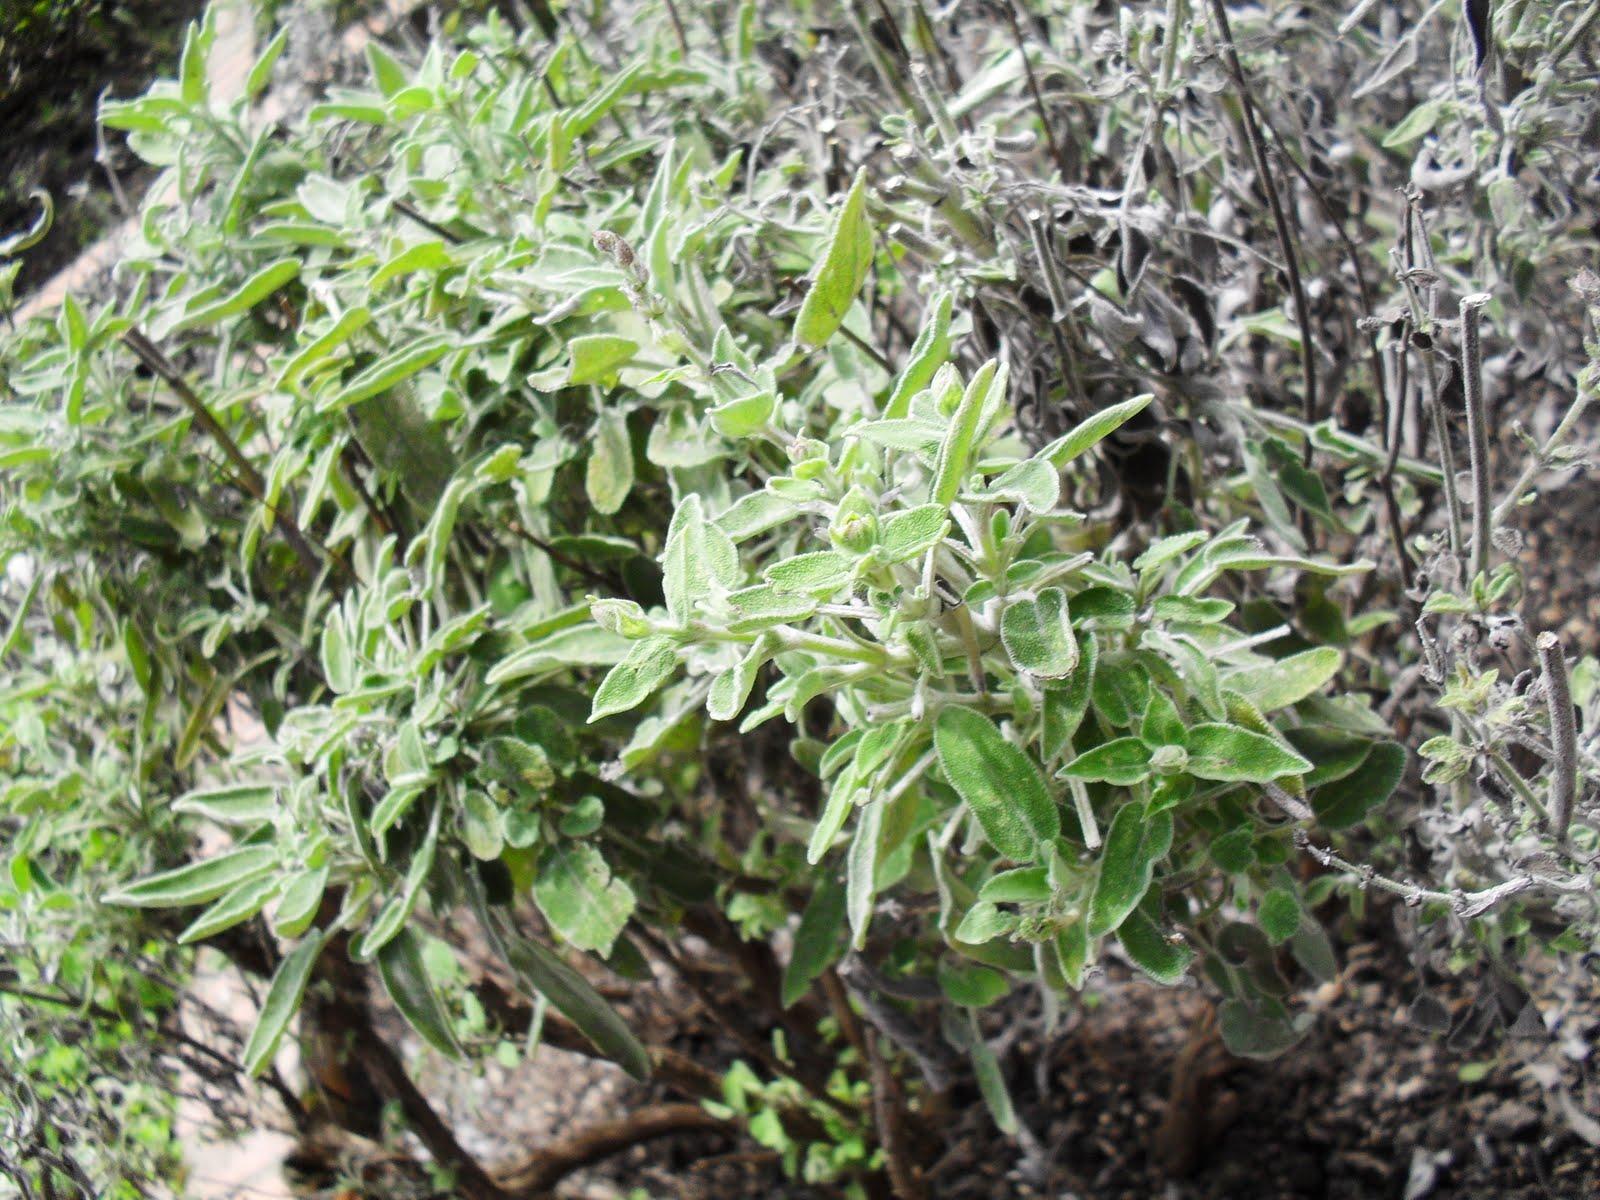 descripción botánica planta herbácea de unos 40 cms de alto con